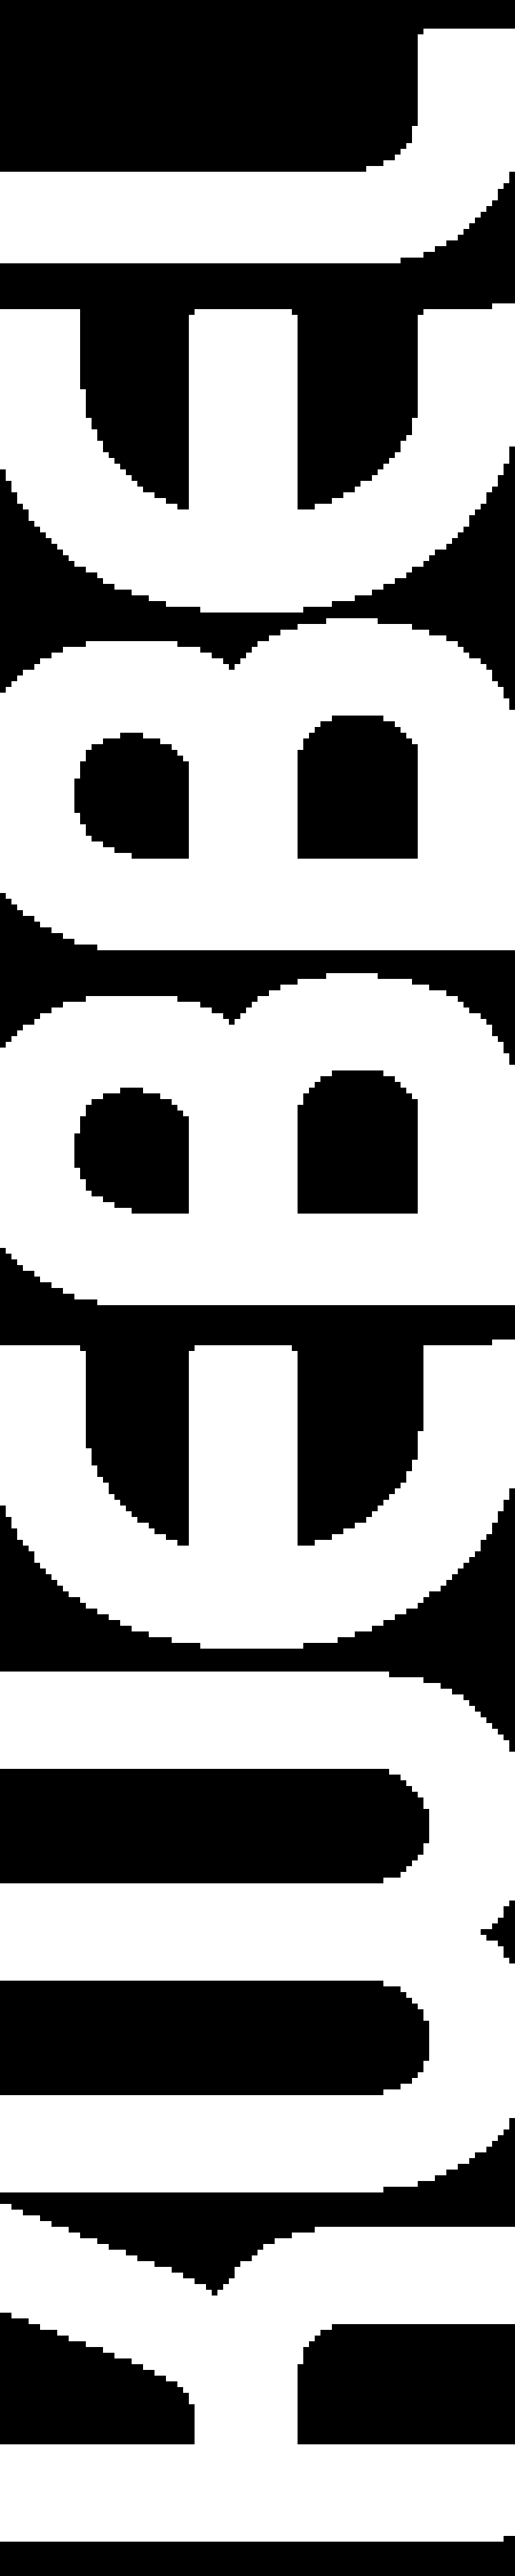 Logopedie Kwebbel Torhout